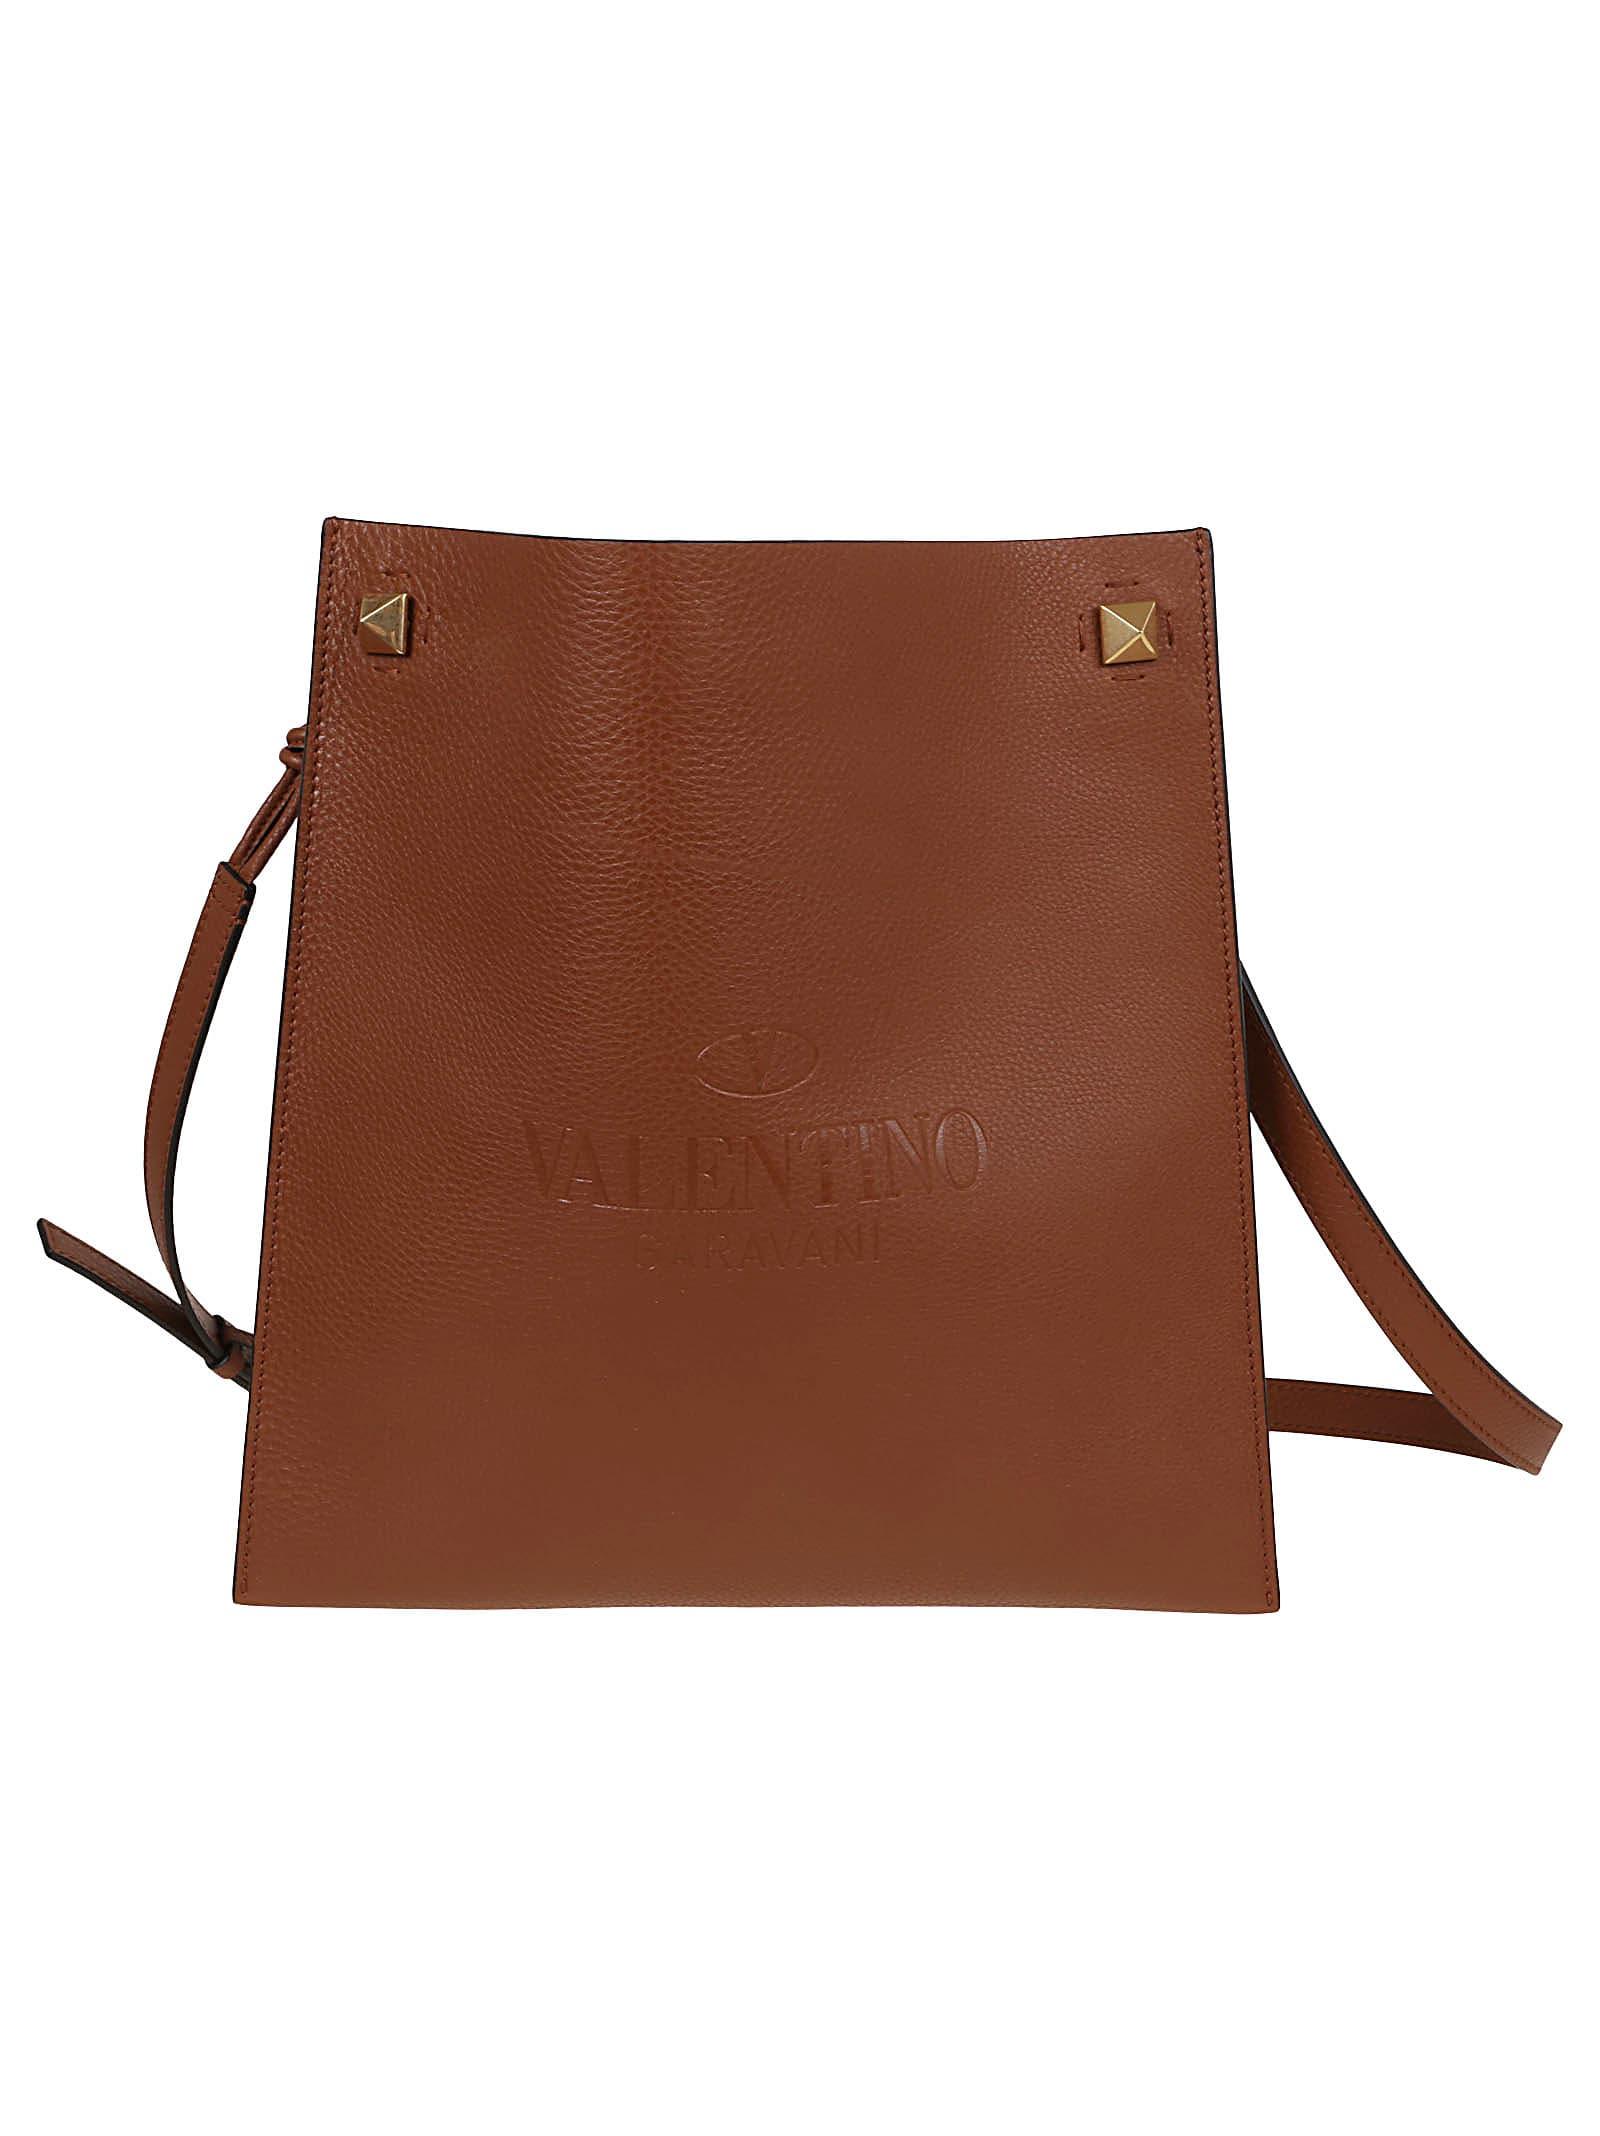 Valentino Bags FLAT CROSS BODY BAG